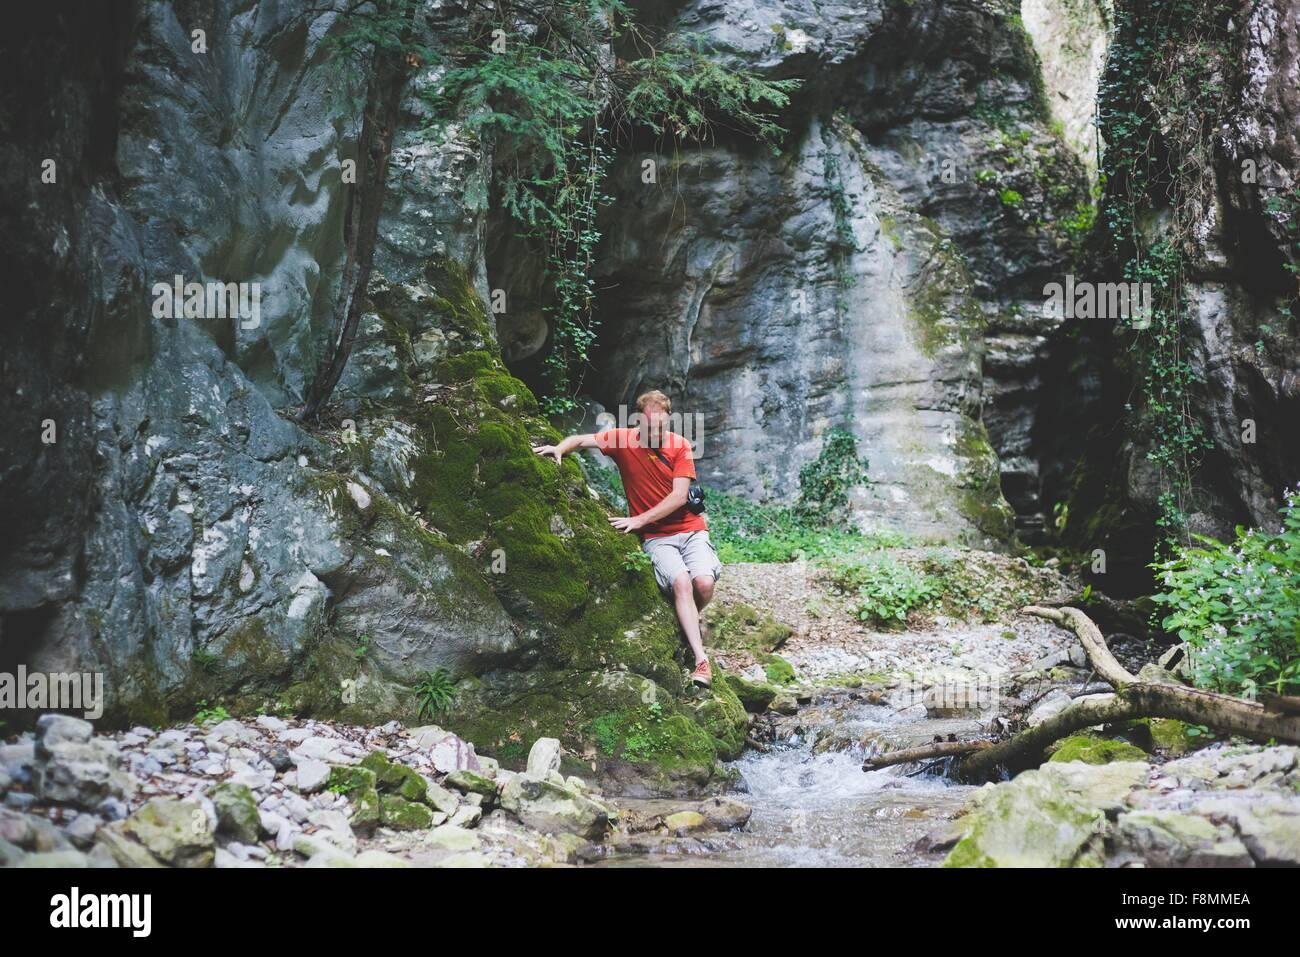 Man exploring rock formation, Garda, Italy - Stock Image